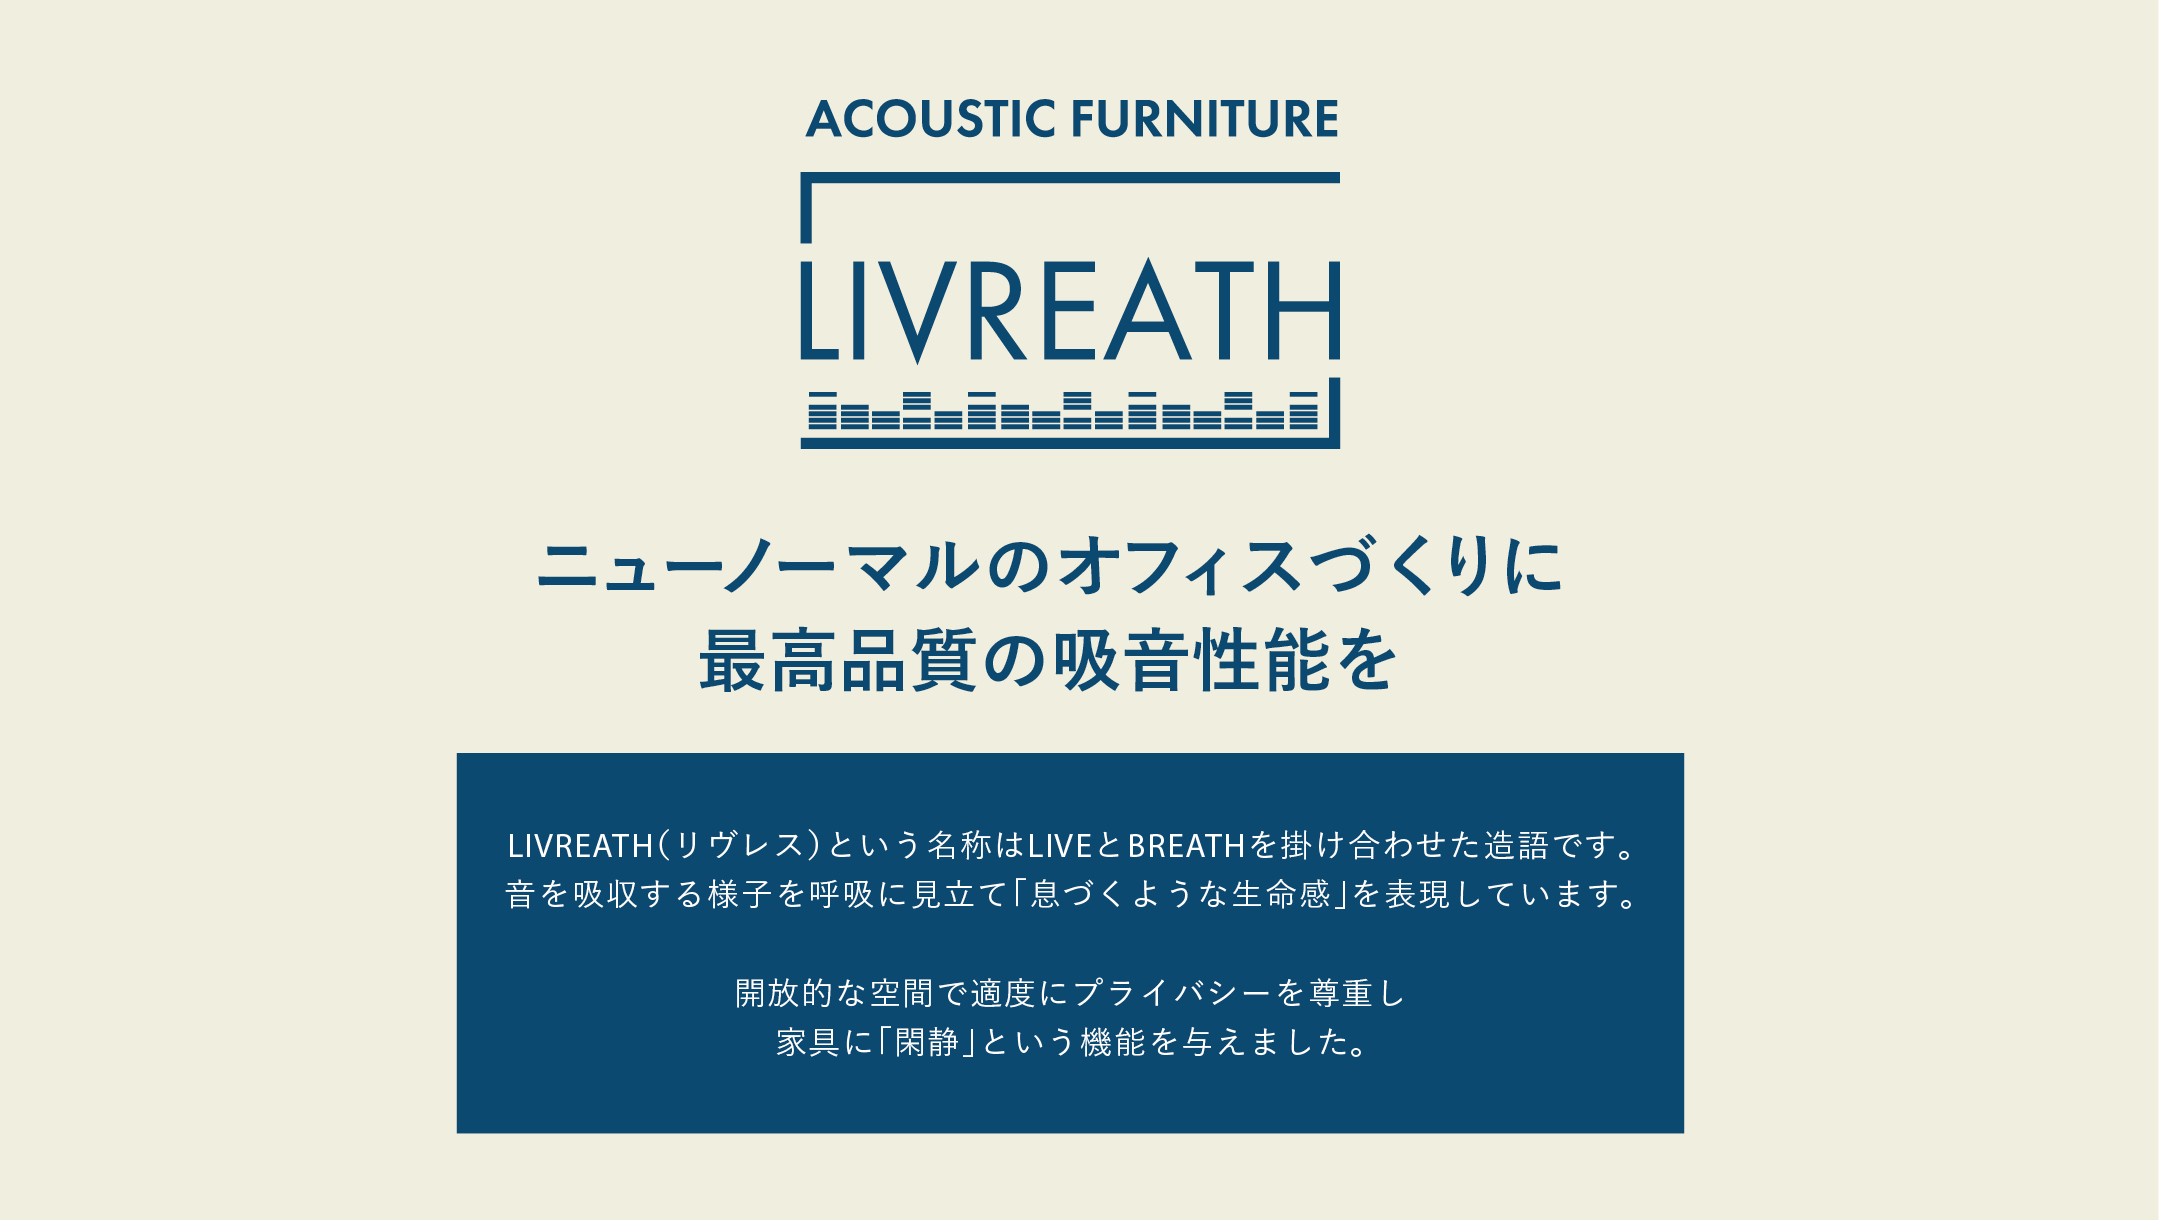 LIVREATH リブレス リヴレス オフィス家具 吸音